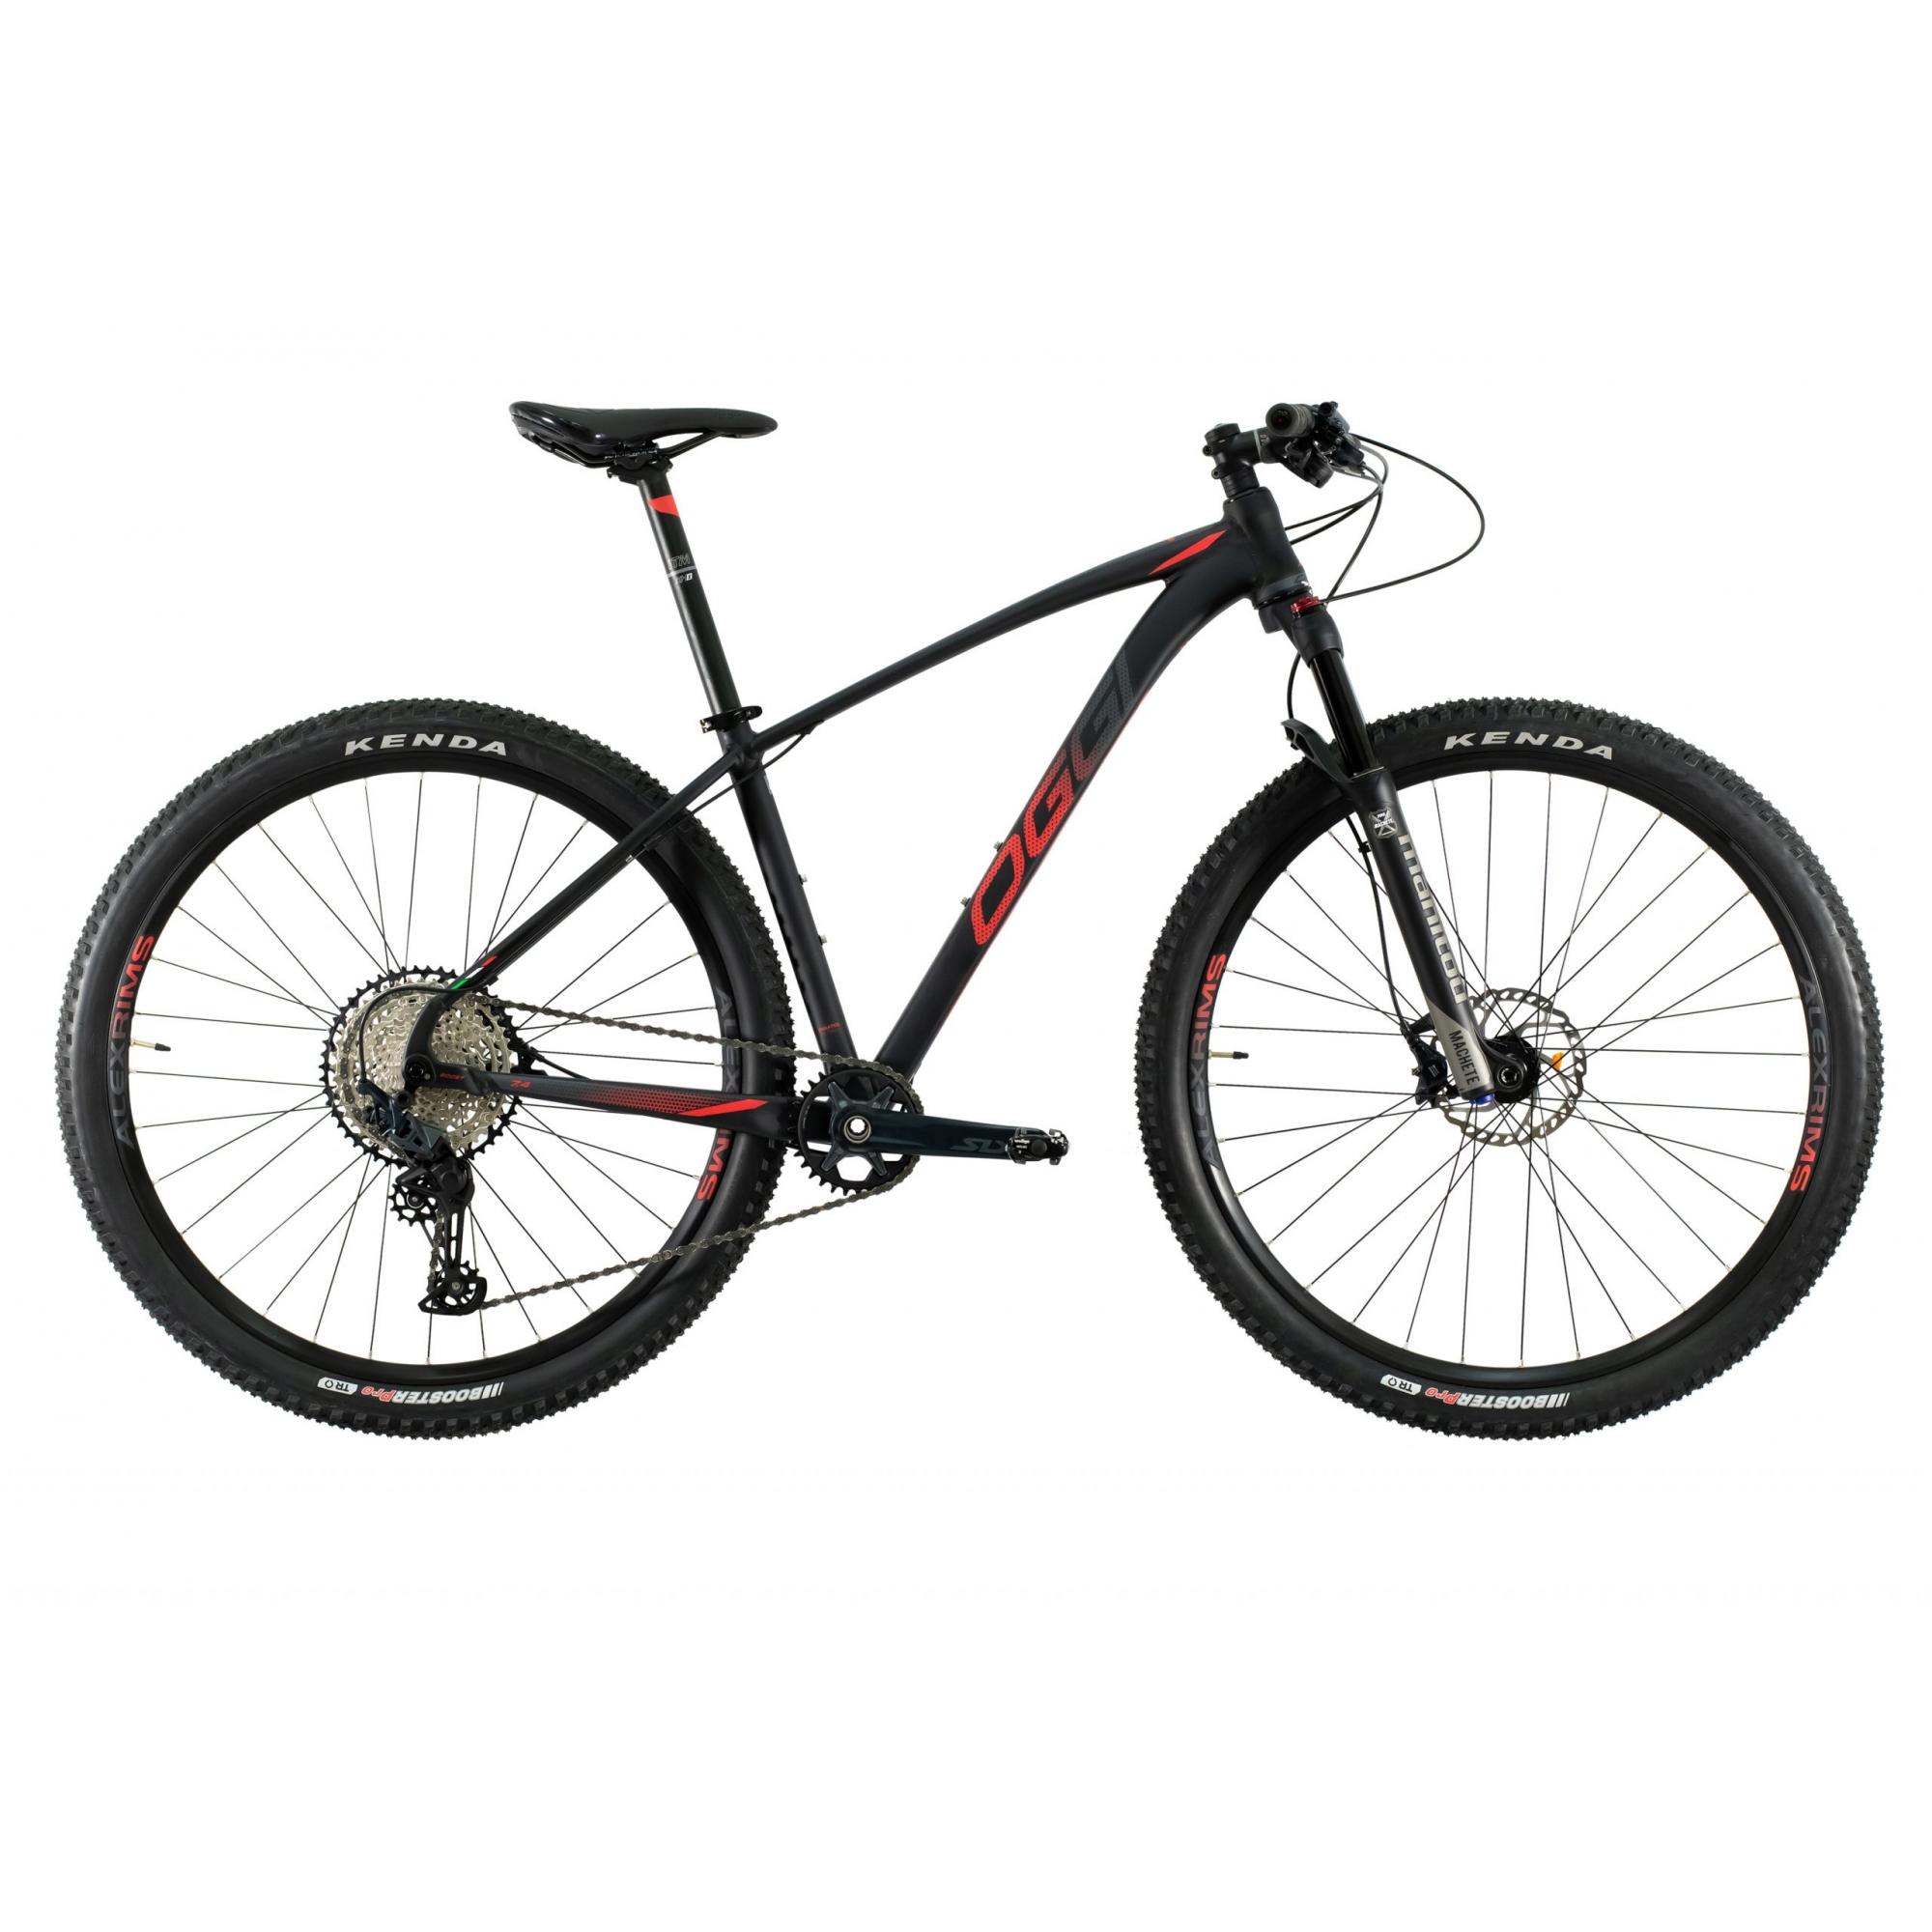 Bicicleta Aro 29 MTB Oggi Big Wheel 7.4 Shimano 12v 2021 - Preto / Vermelho / Grafite